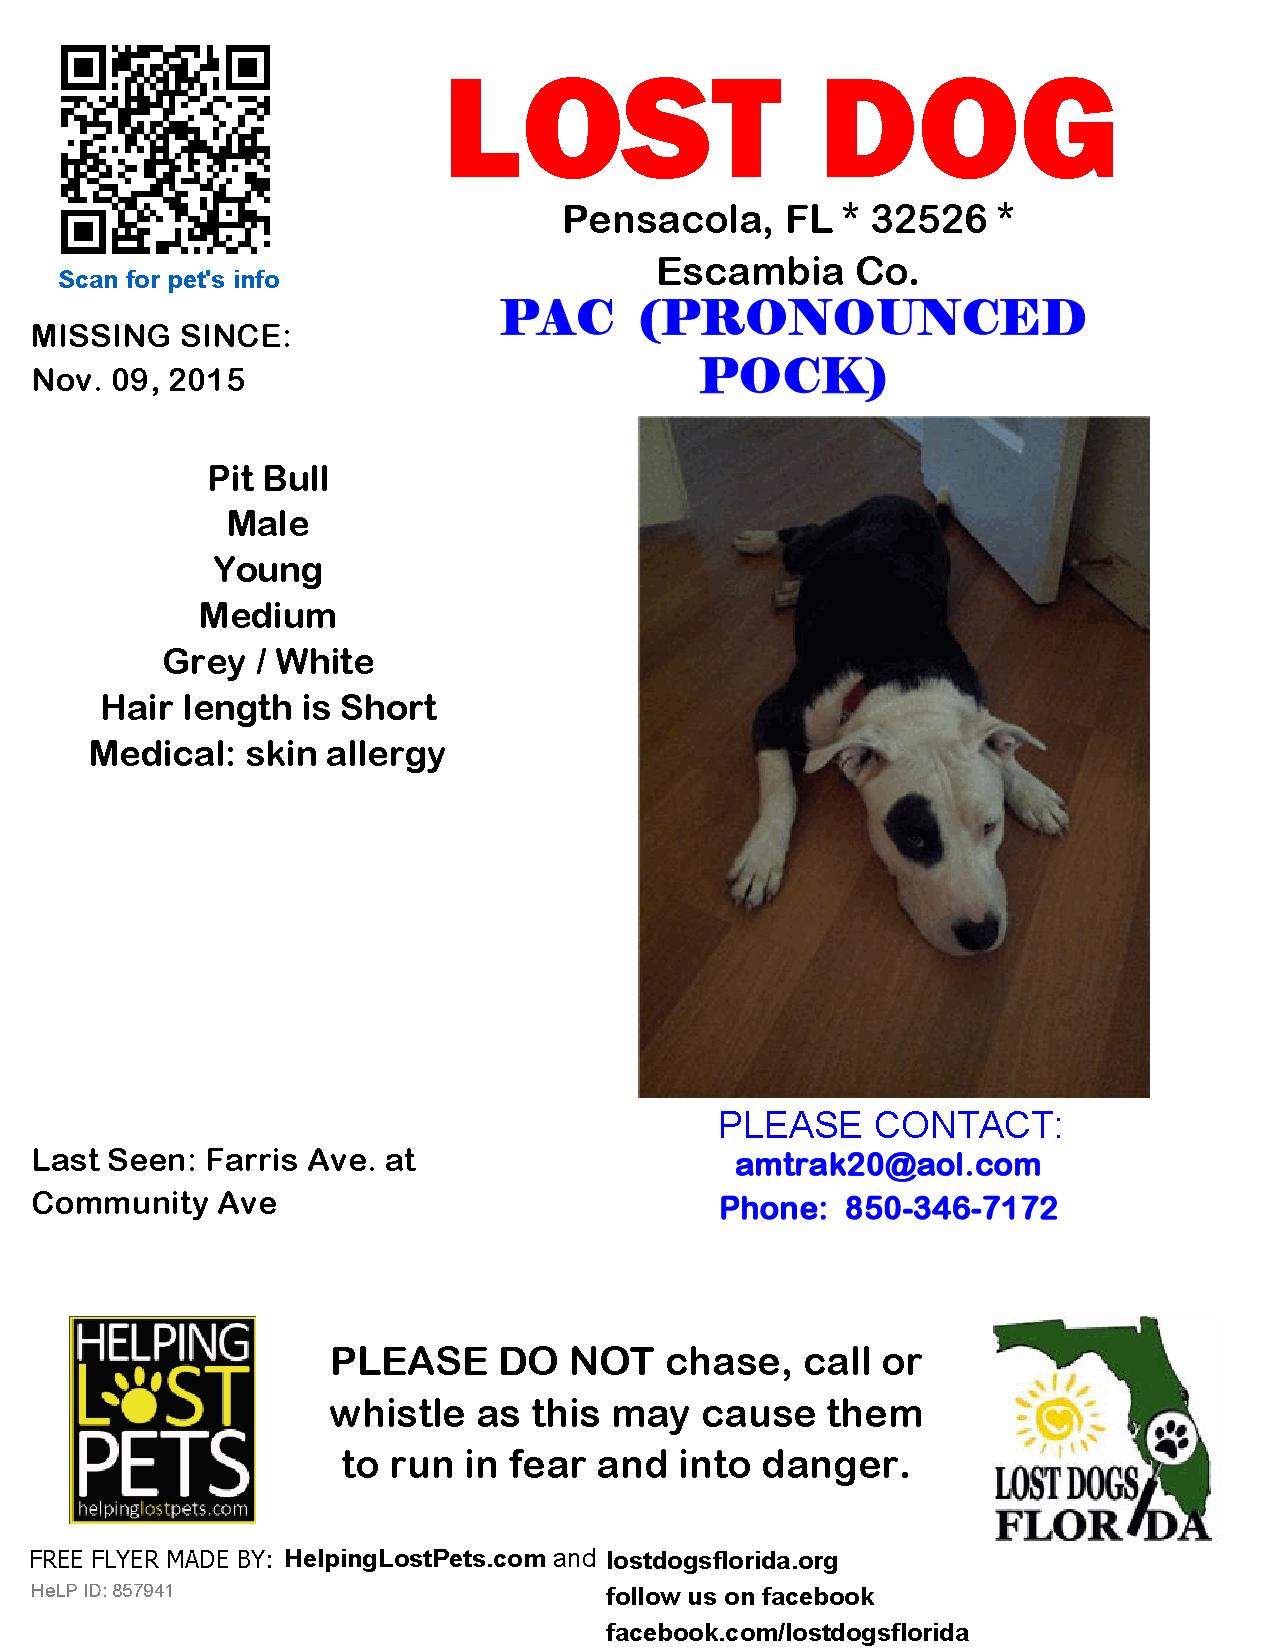 Lost Dog - Pit Bull - Pensacola, FL, United States | Lost